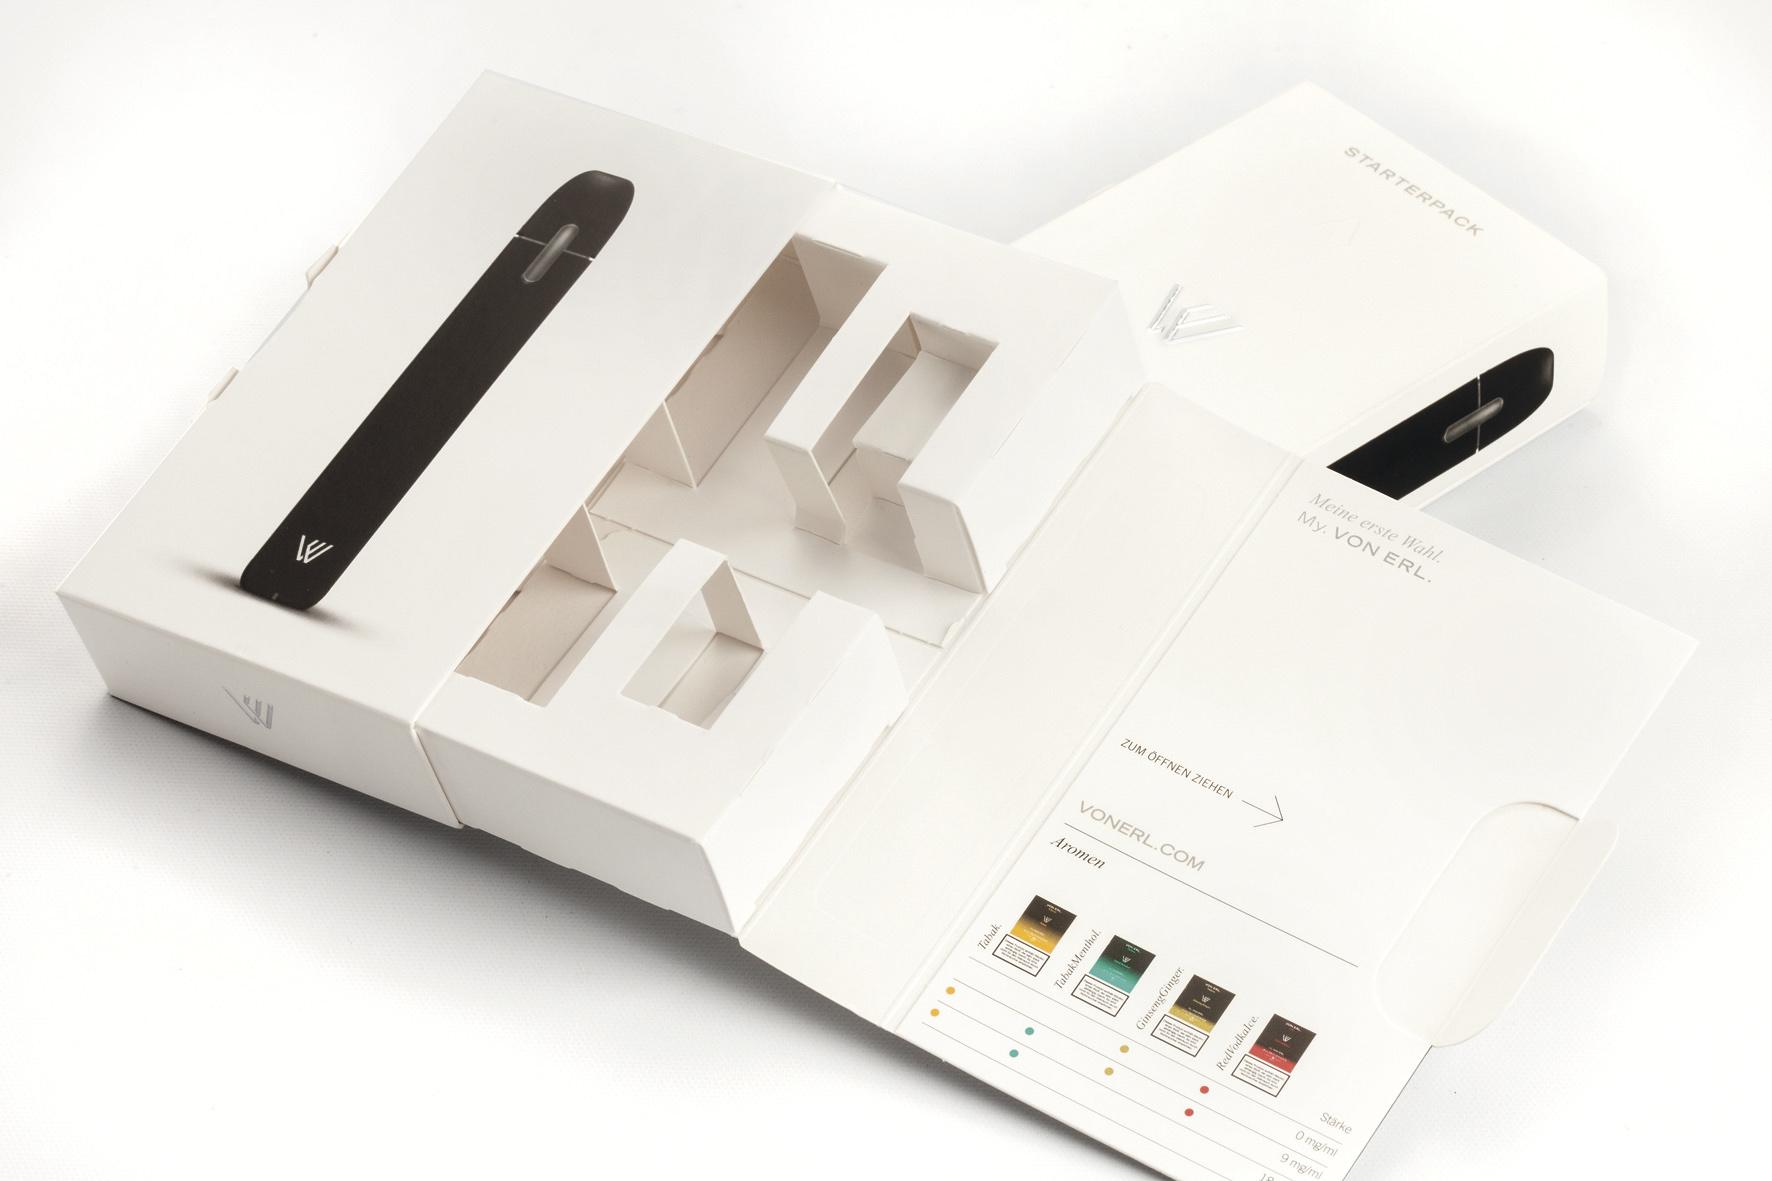 carton-award-image 129431